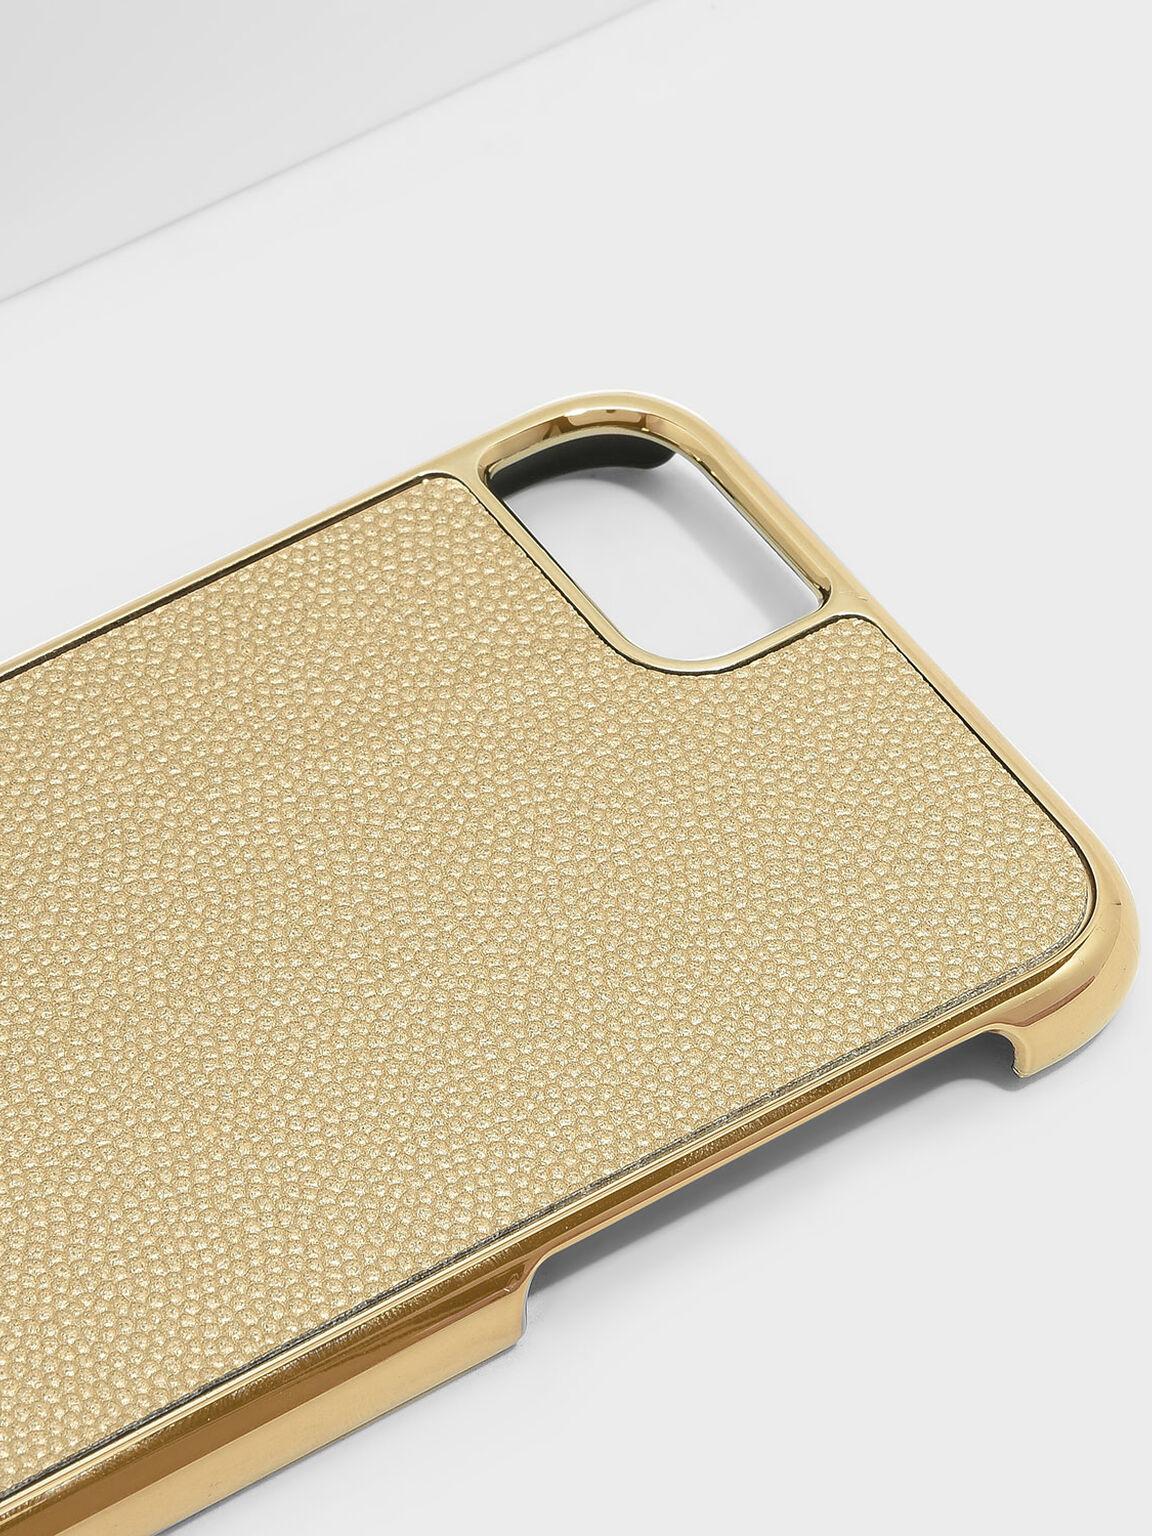 iPhone 7/8 Textured Case, Gold, hi-res